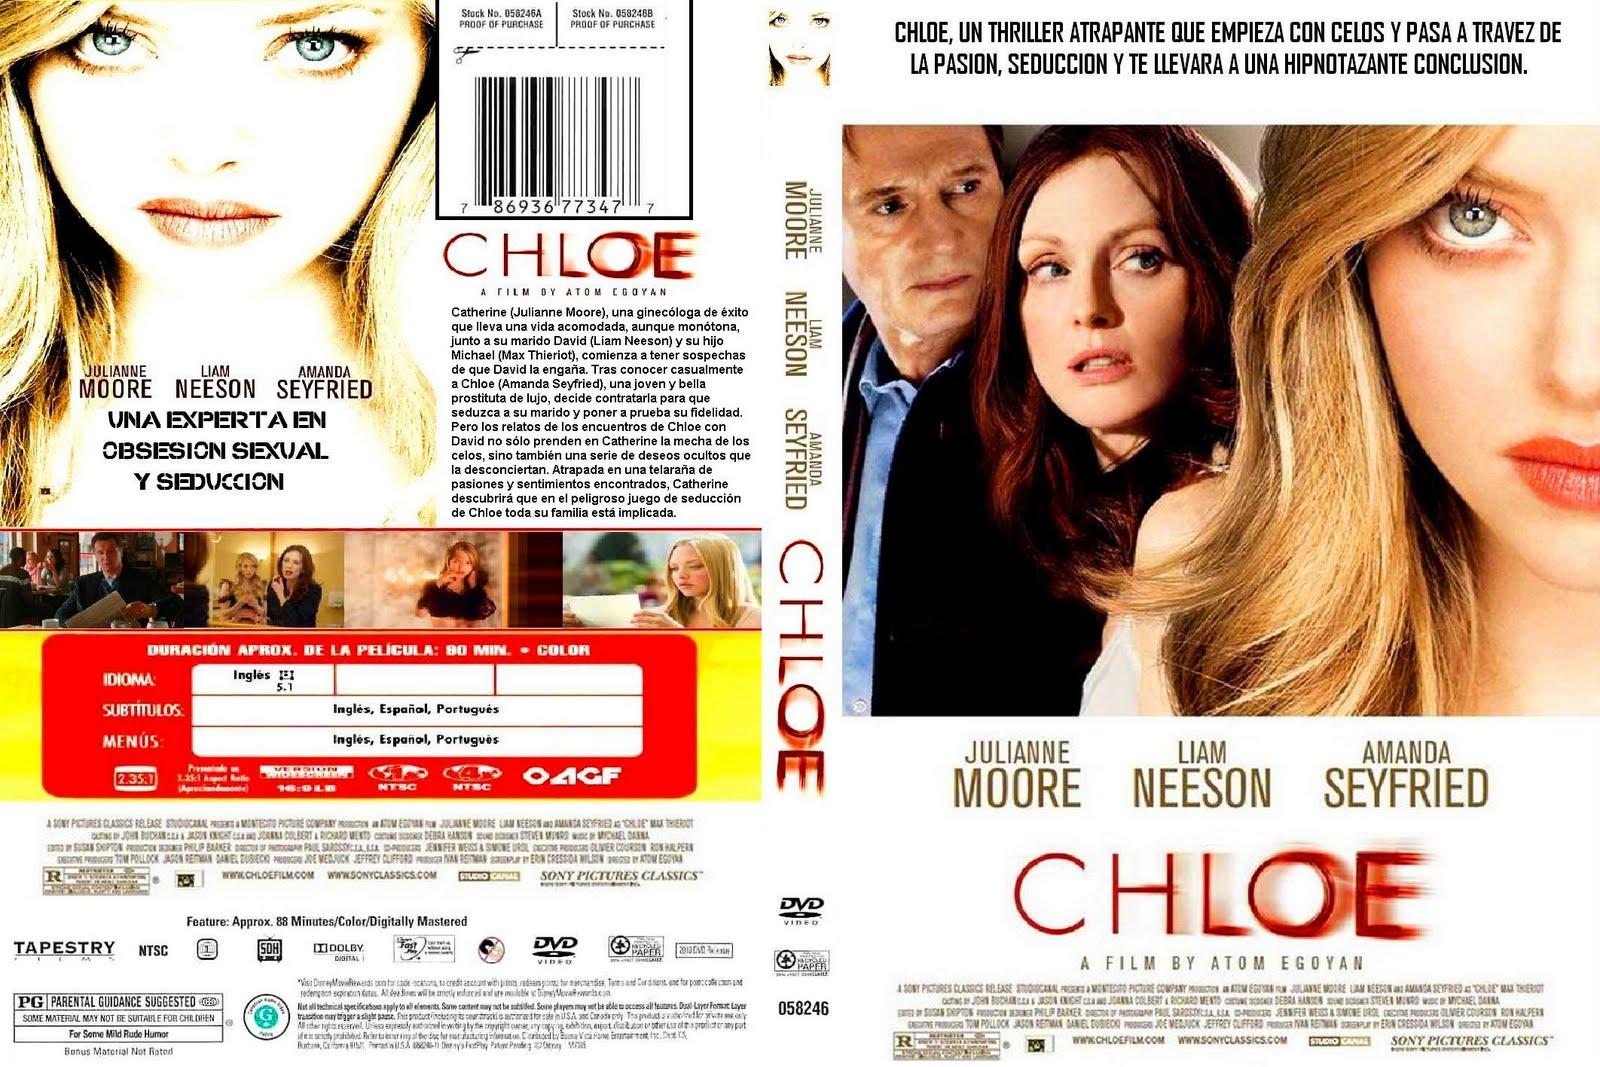 http://1.bp.blogspot.com/_R8FMZIDmtTY/TGqhpEEk3NI/AAAAAAAACzM/PuI7BCtRNMk/s1600/Chloe_-_Custom_por_jonatan_casas.jpg